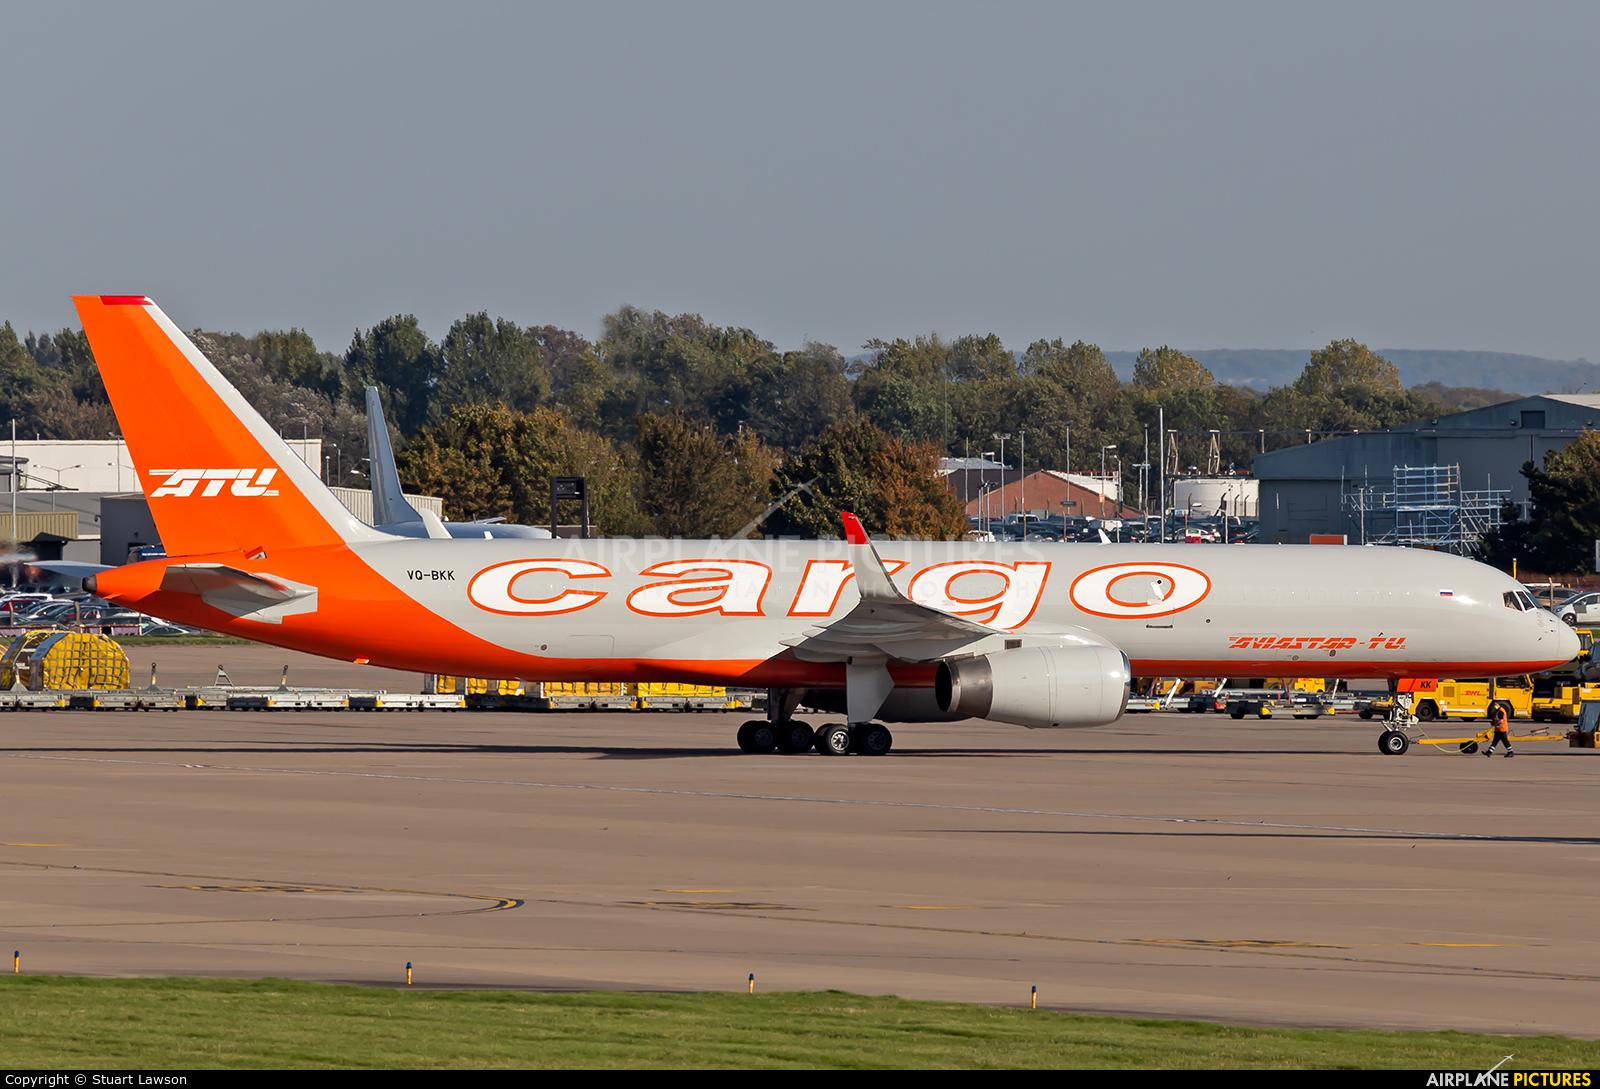 Aviastar-Tu VQ-BKK aircraft at East Midlands